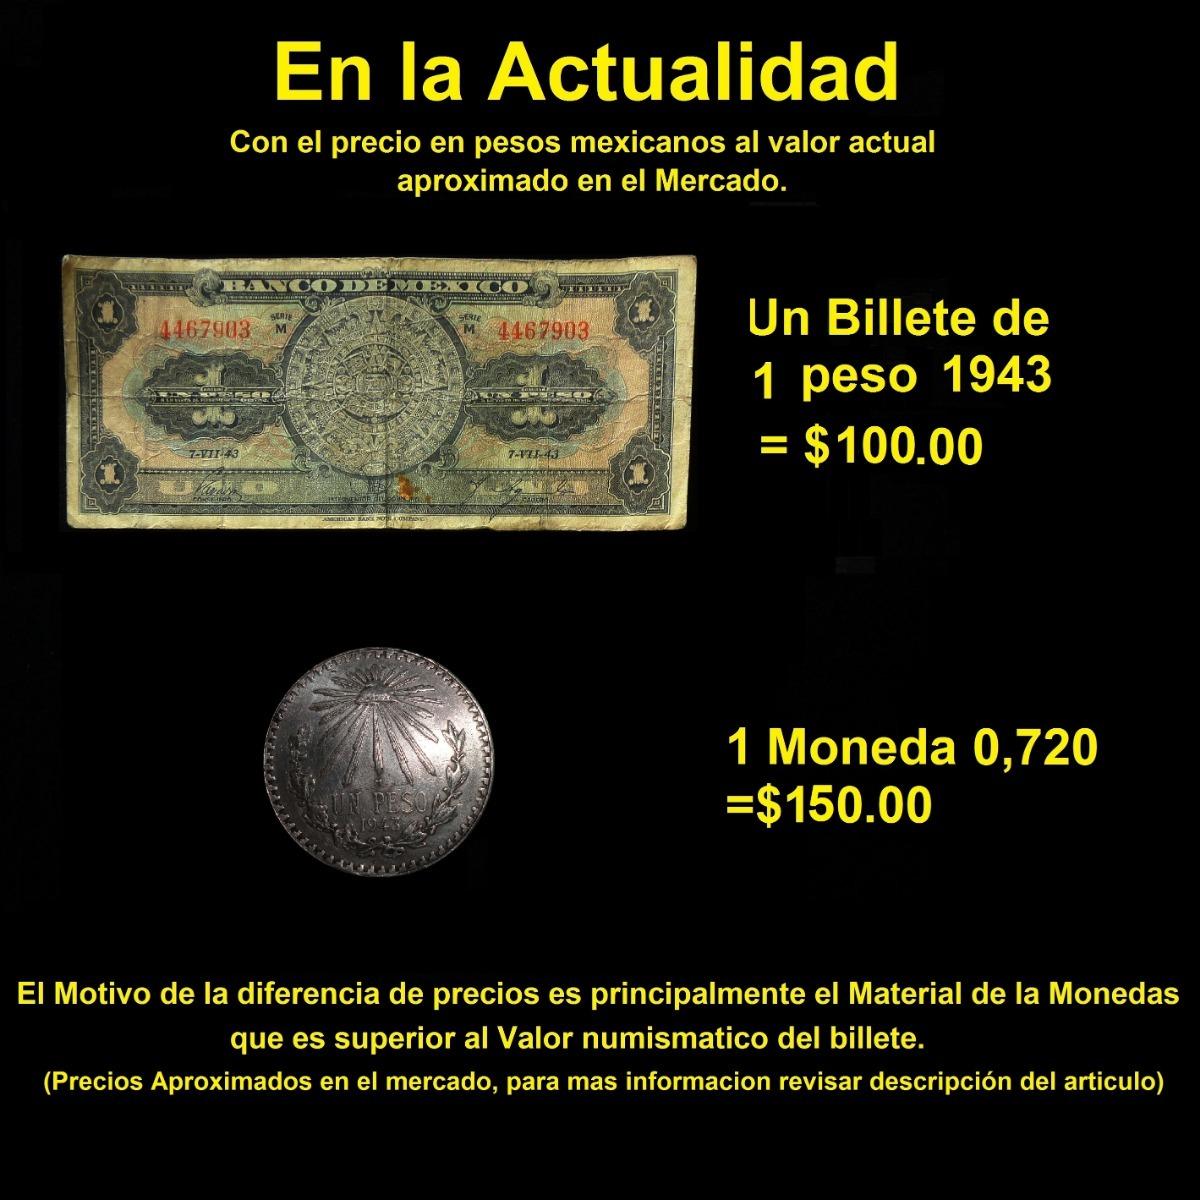 Calendario Con Note.Billete 1 Peso 1943 Calendario Fecha Baja American Bank Note 100 00